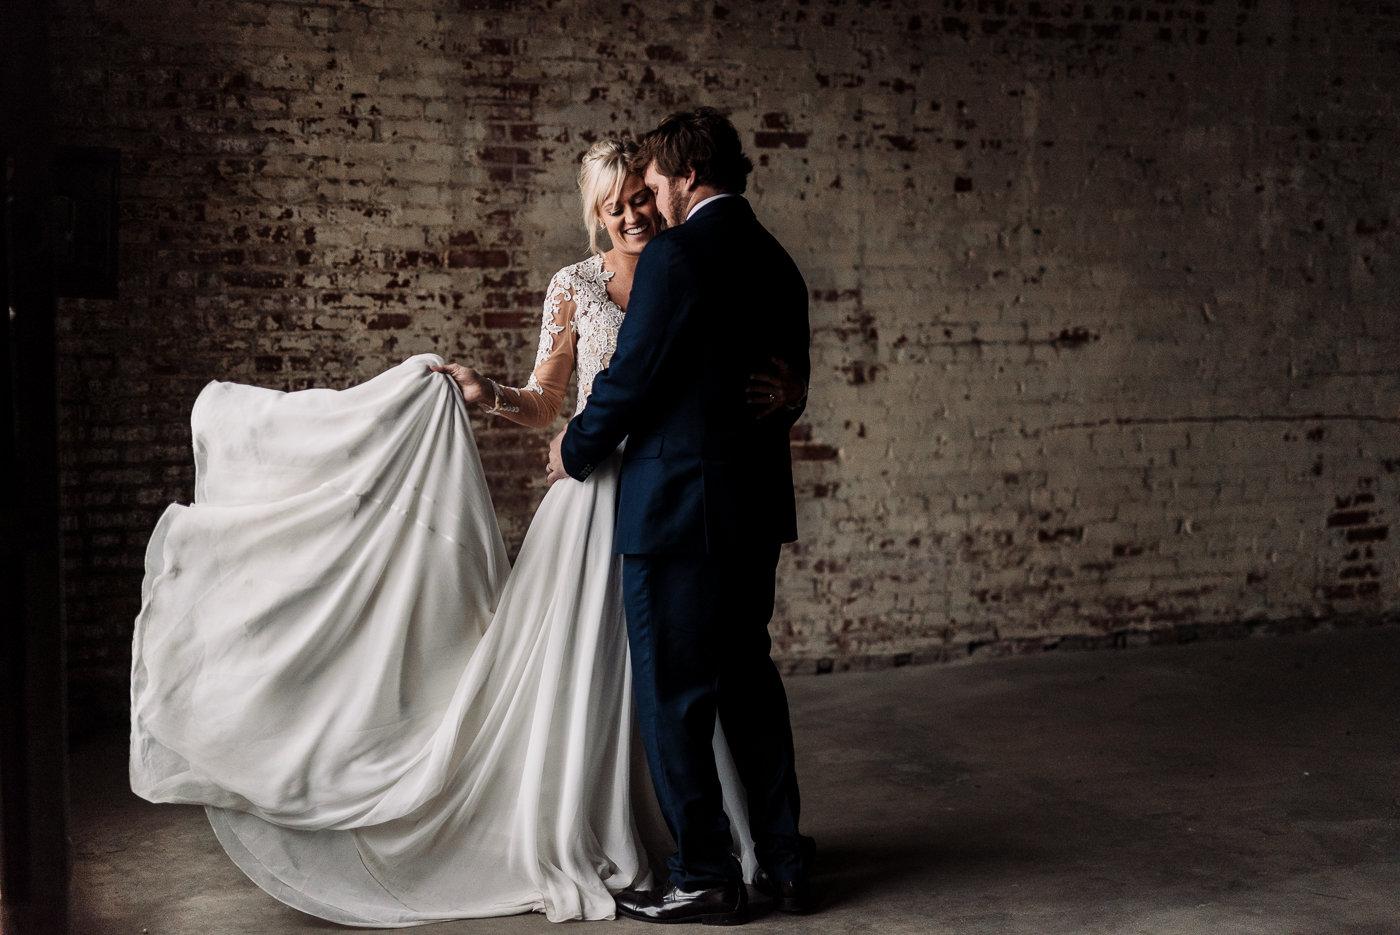 Prescott Bridal | Oklahoma City Wedding Dresses and Gowns - Winter Wedding Styled Shoot